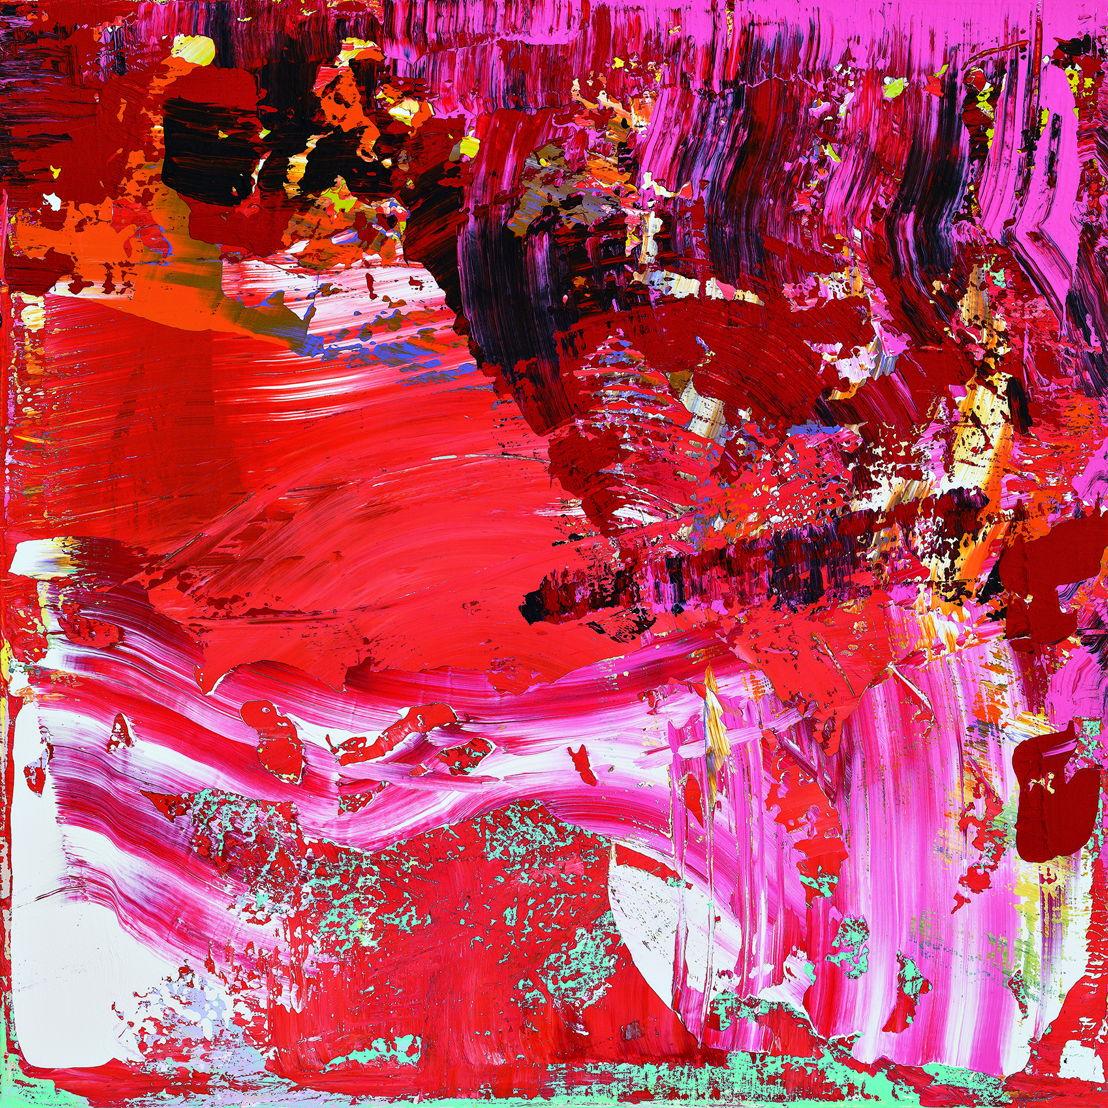 SAF Dongi Li, Love Me Tender, 2014, Acrylic on canvas, 70x70cm